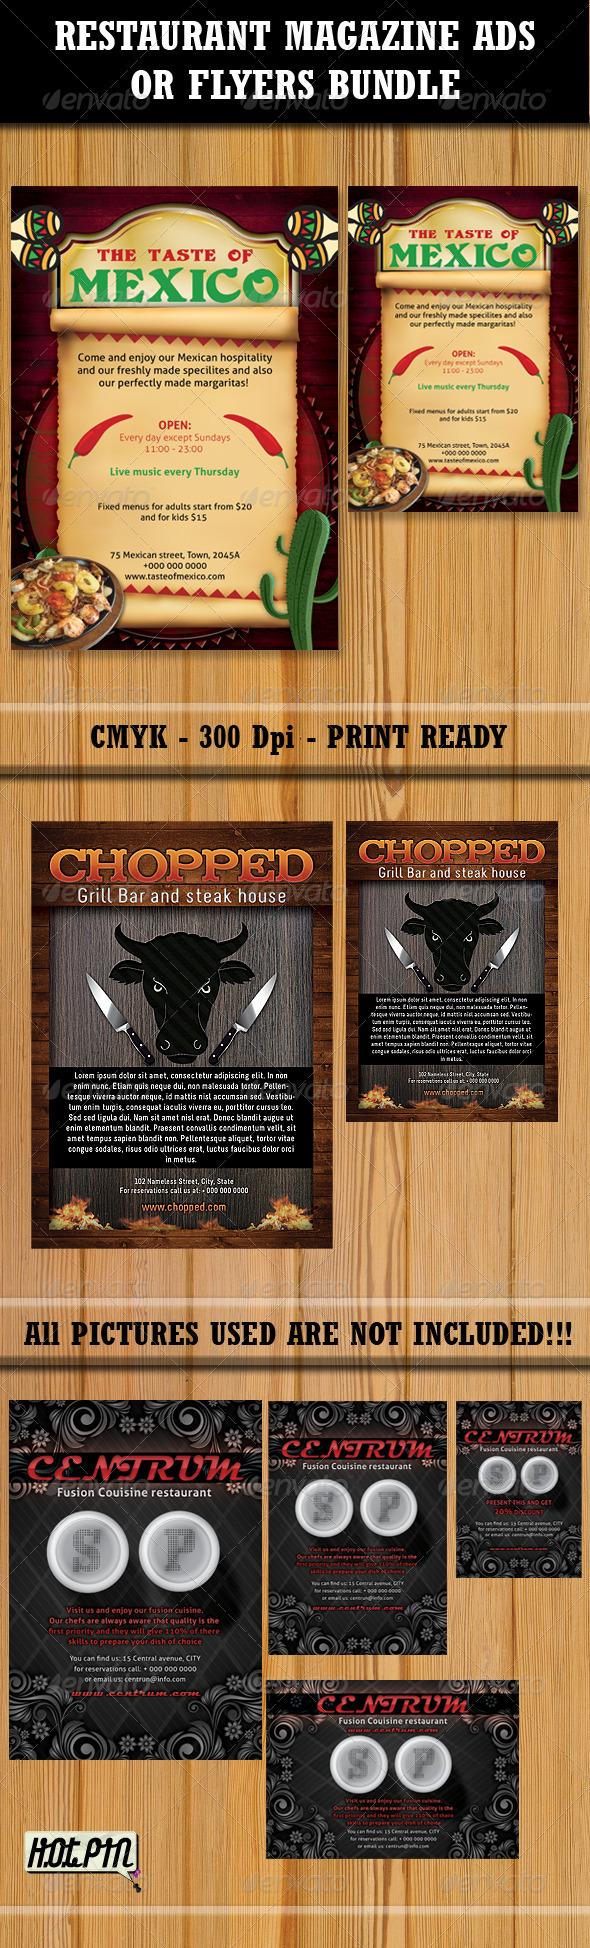 Graphic River Restaurant Magazine Ads-Flyers Bundle 2 Print Templates -  Flyers  Restaurant 459467